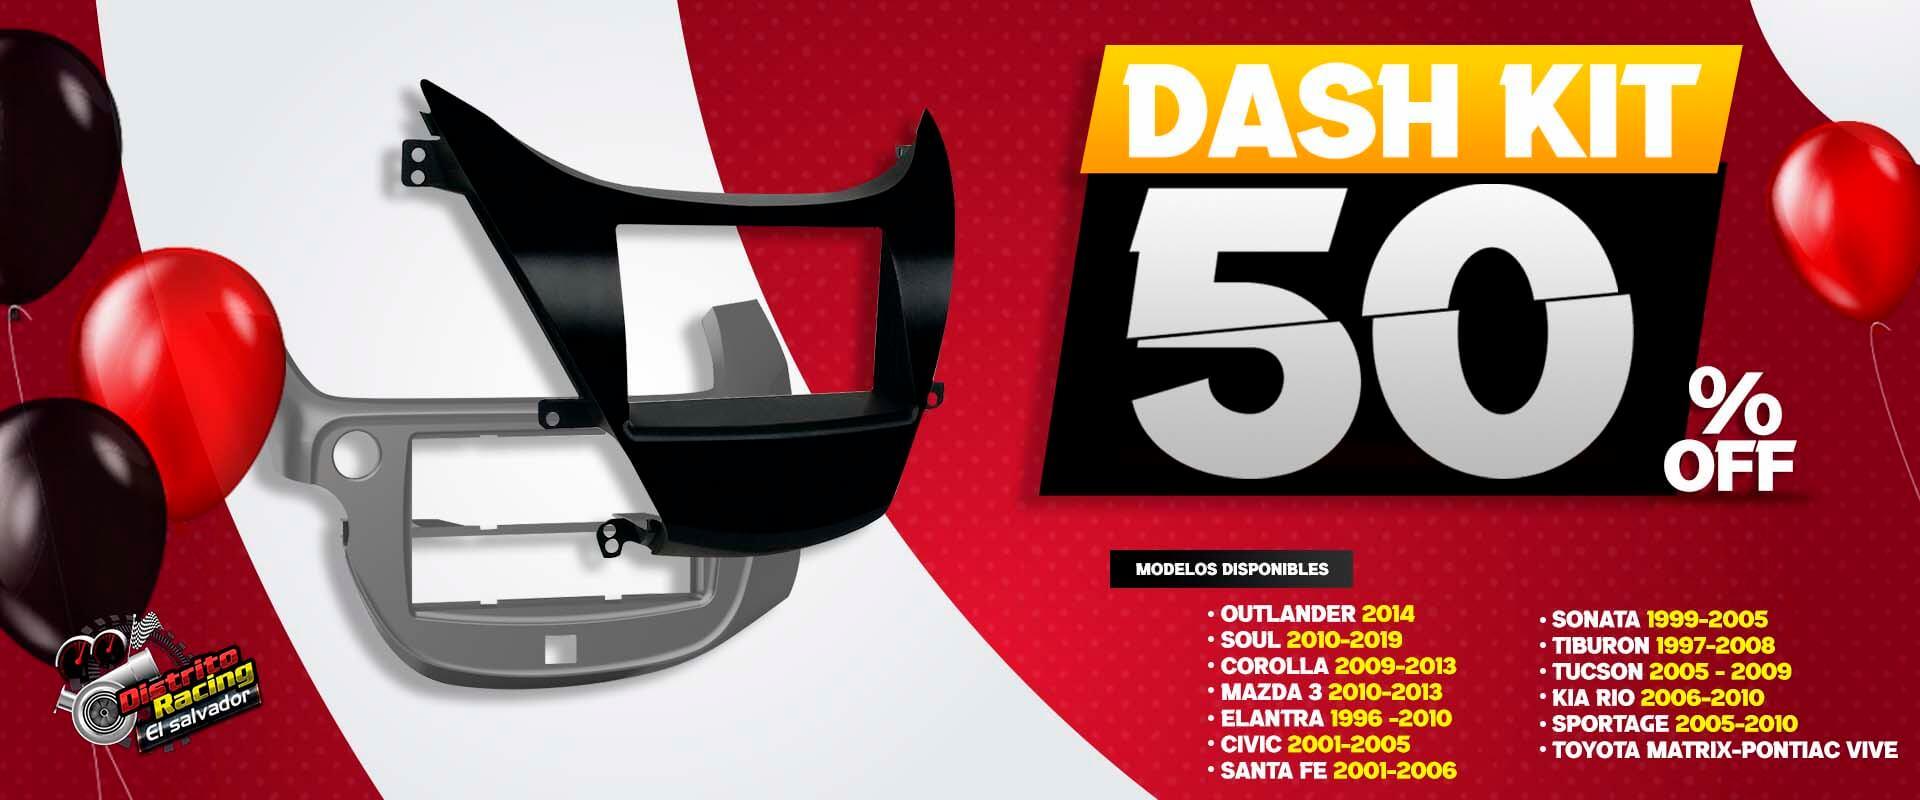 Dash kit 50 descuento